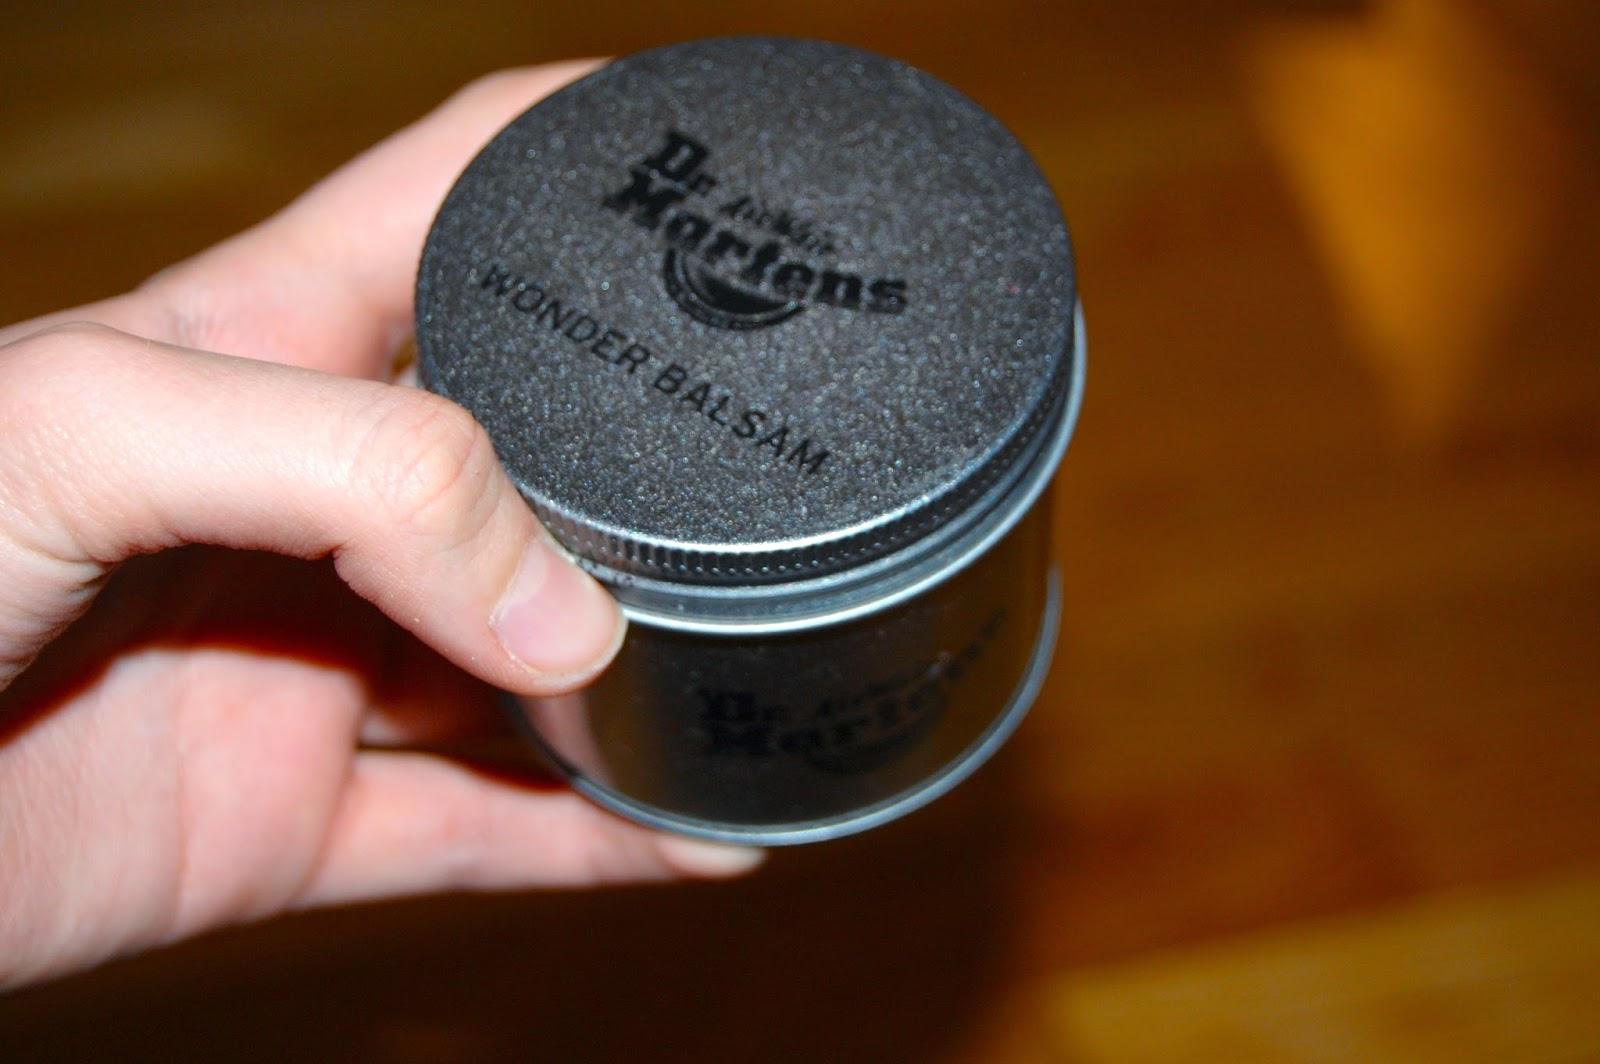 how to use dr martens wonder balsam